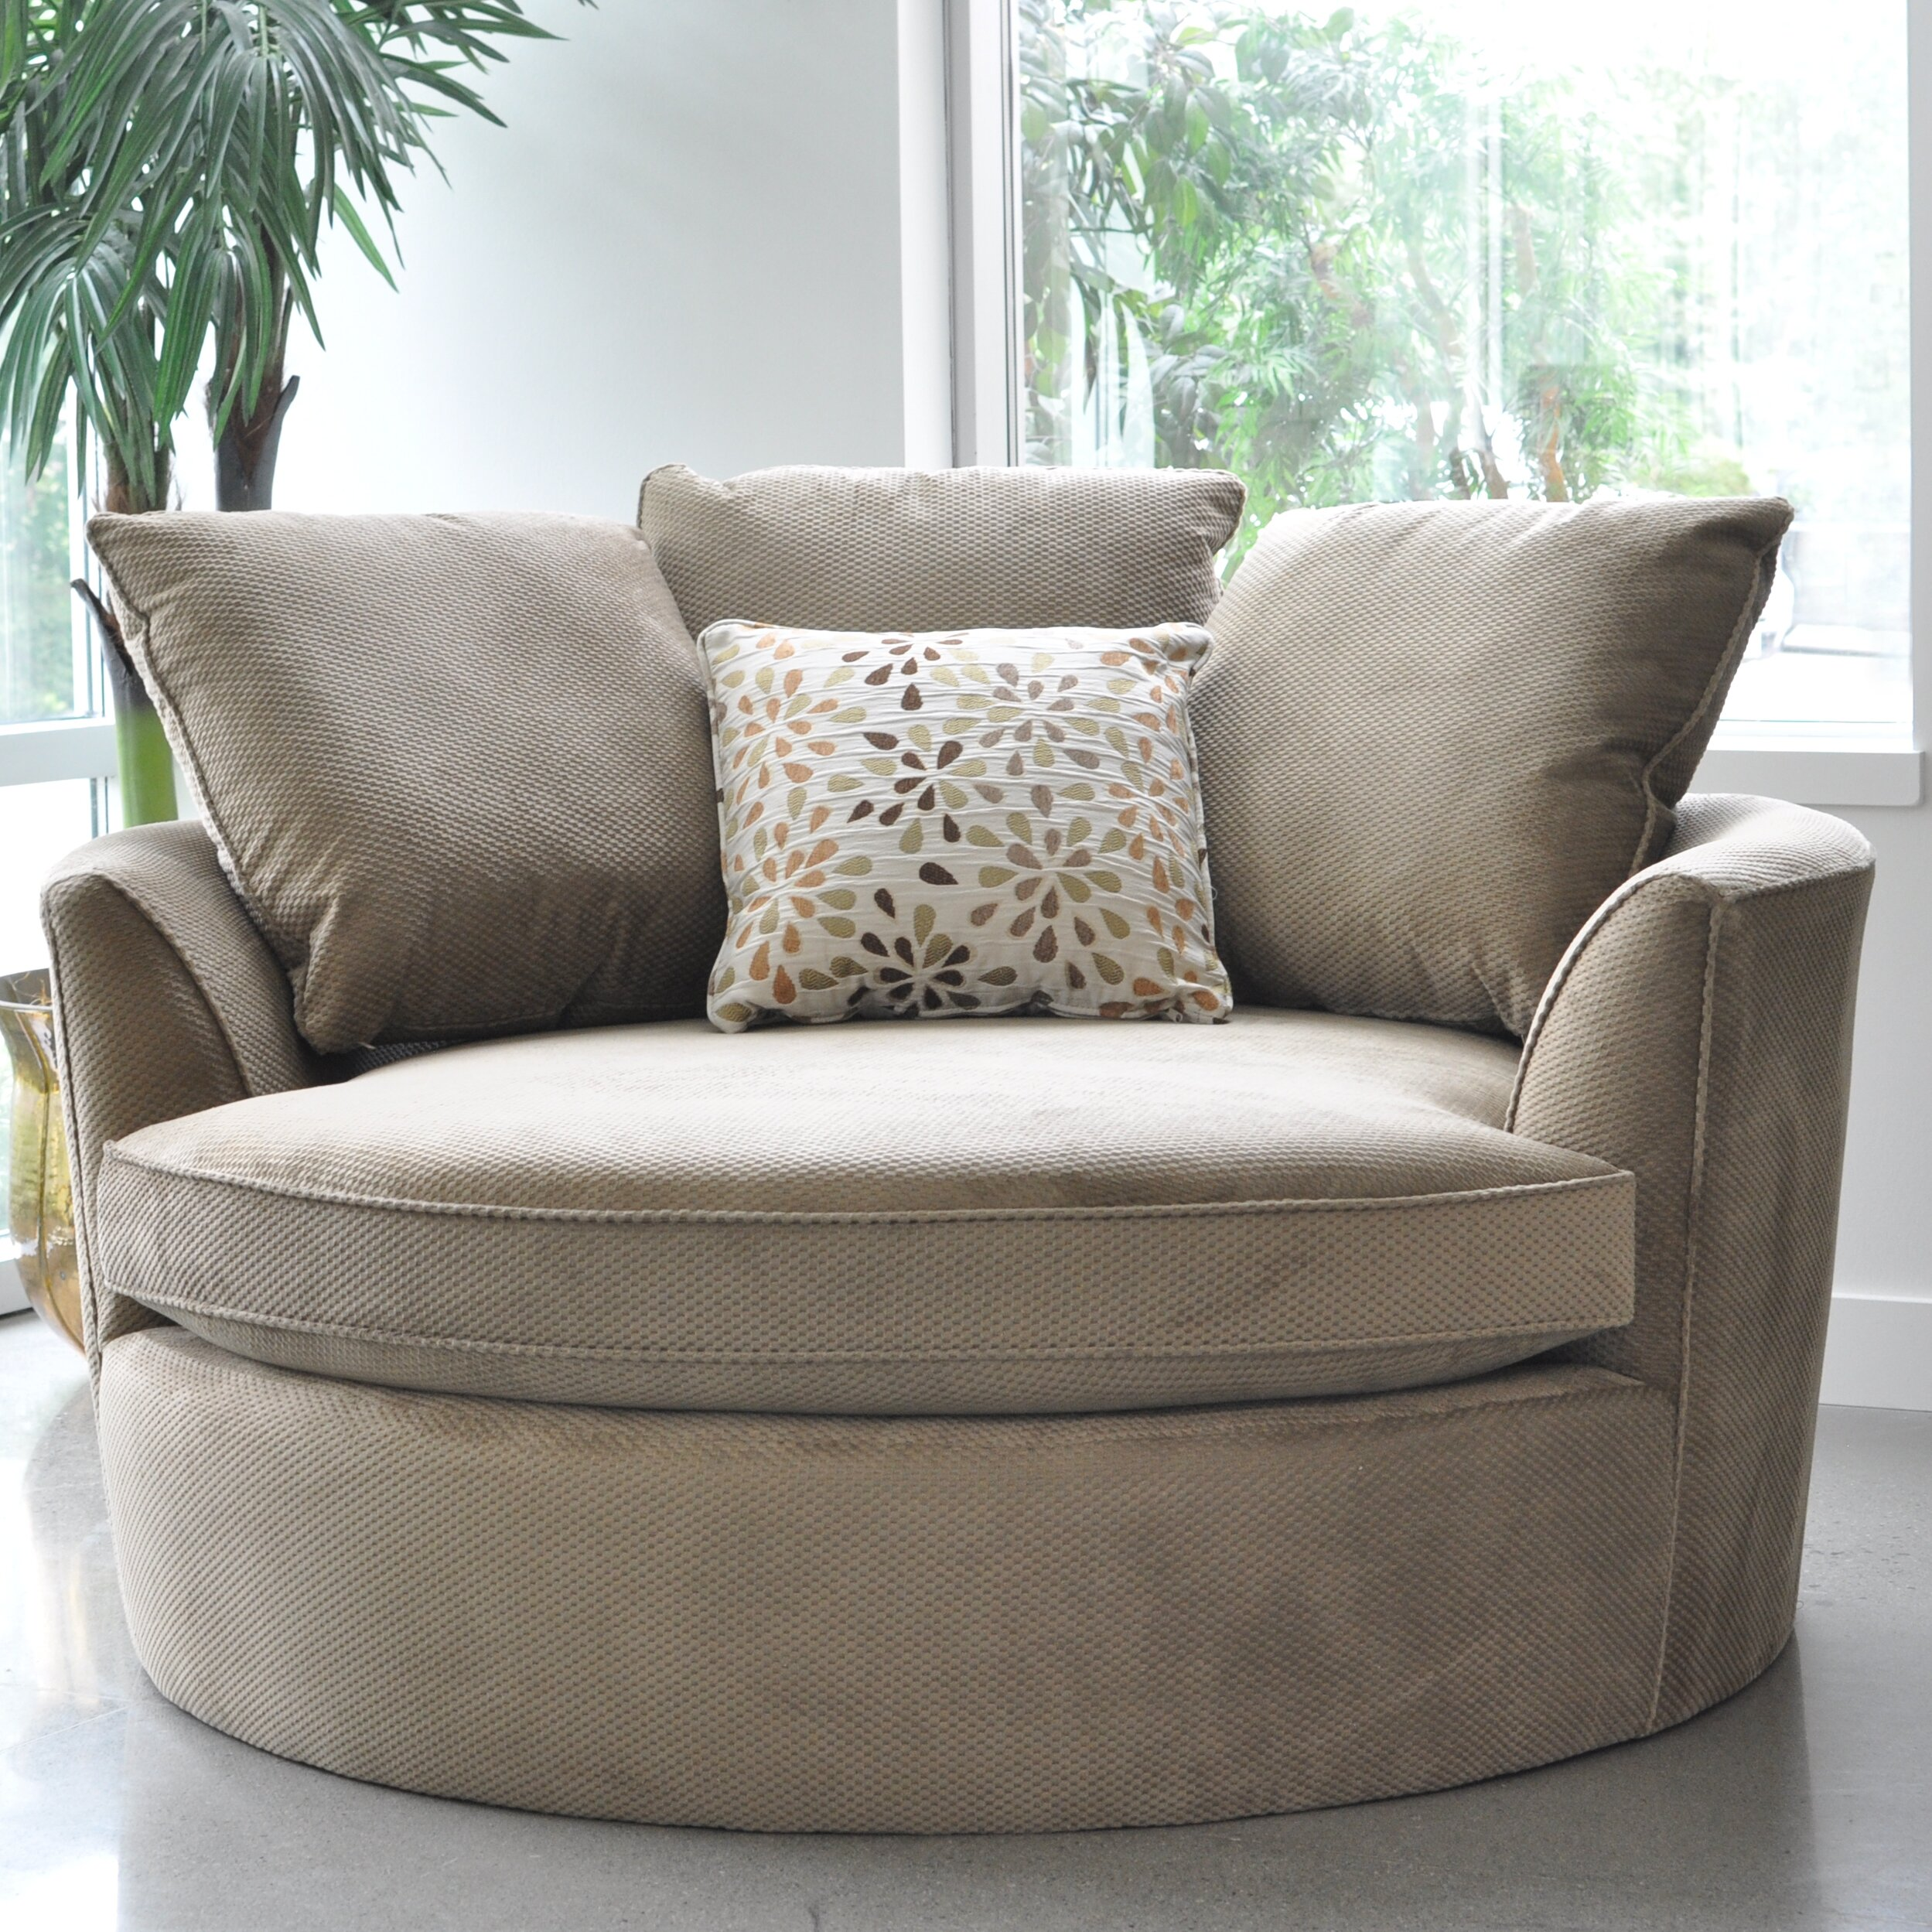 Sofas to Go Cuddler Barrel Chair